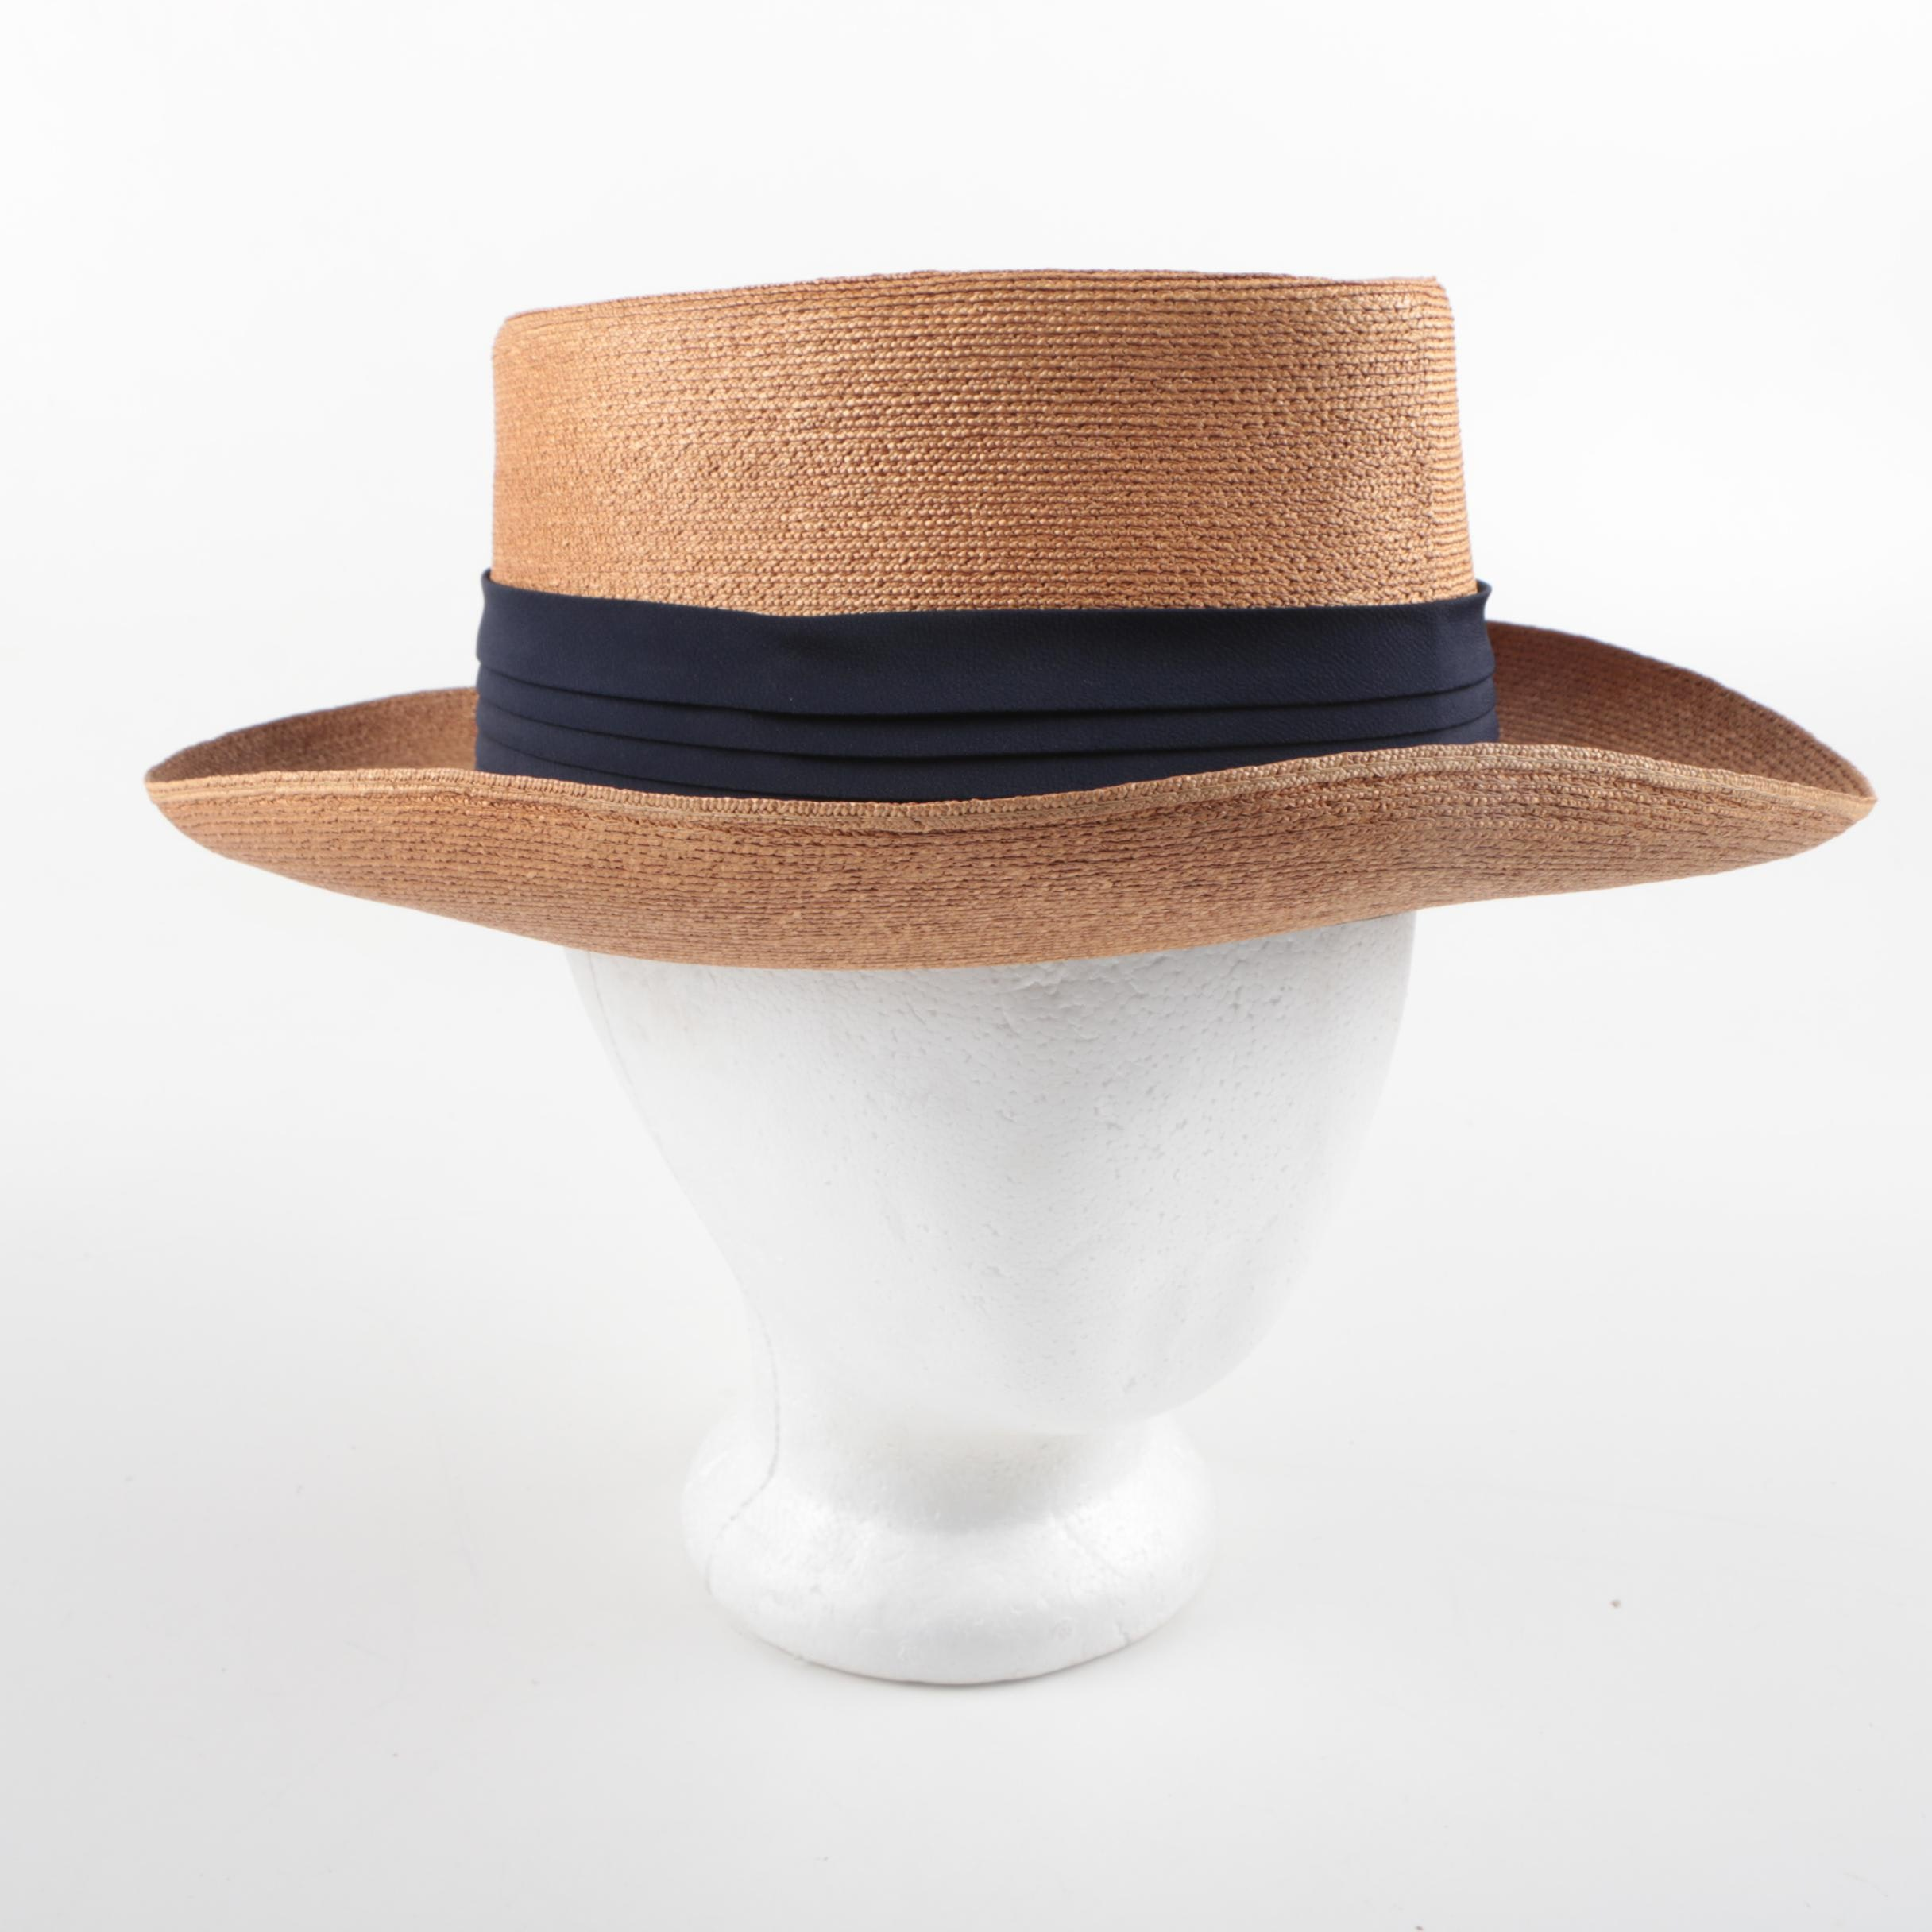 Ecuadorian Panama Hat Company Toquila Straw Gambler Hat